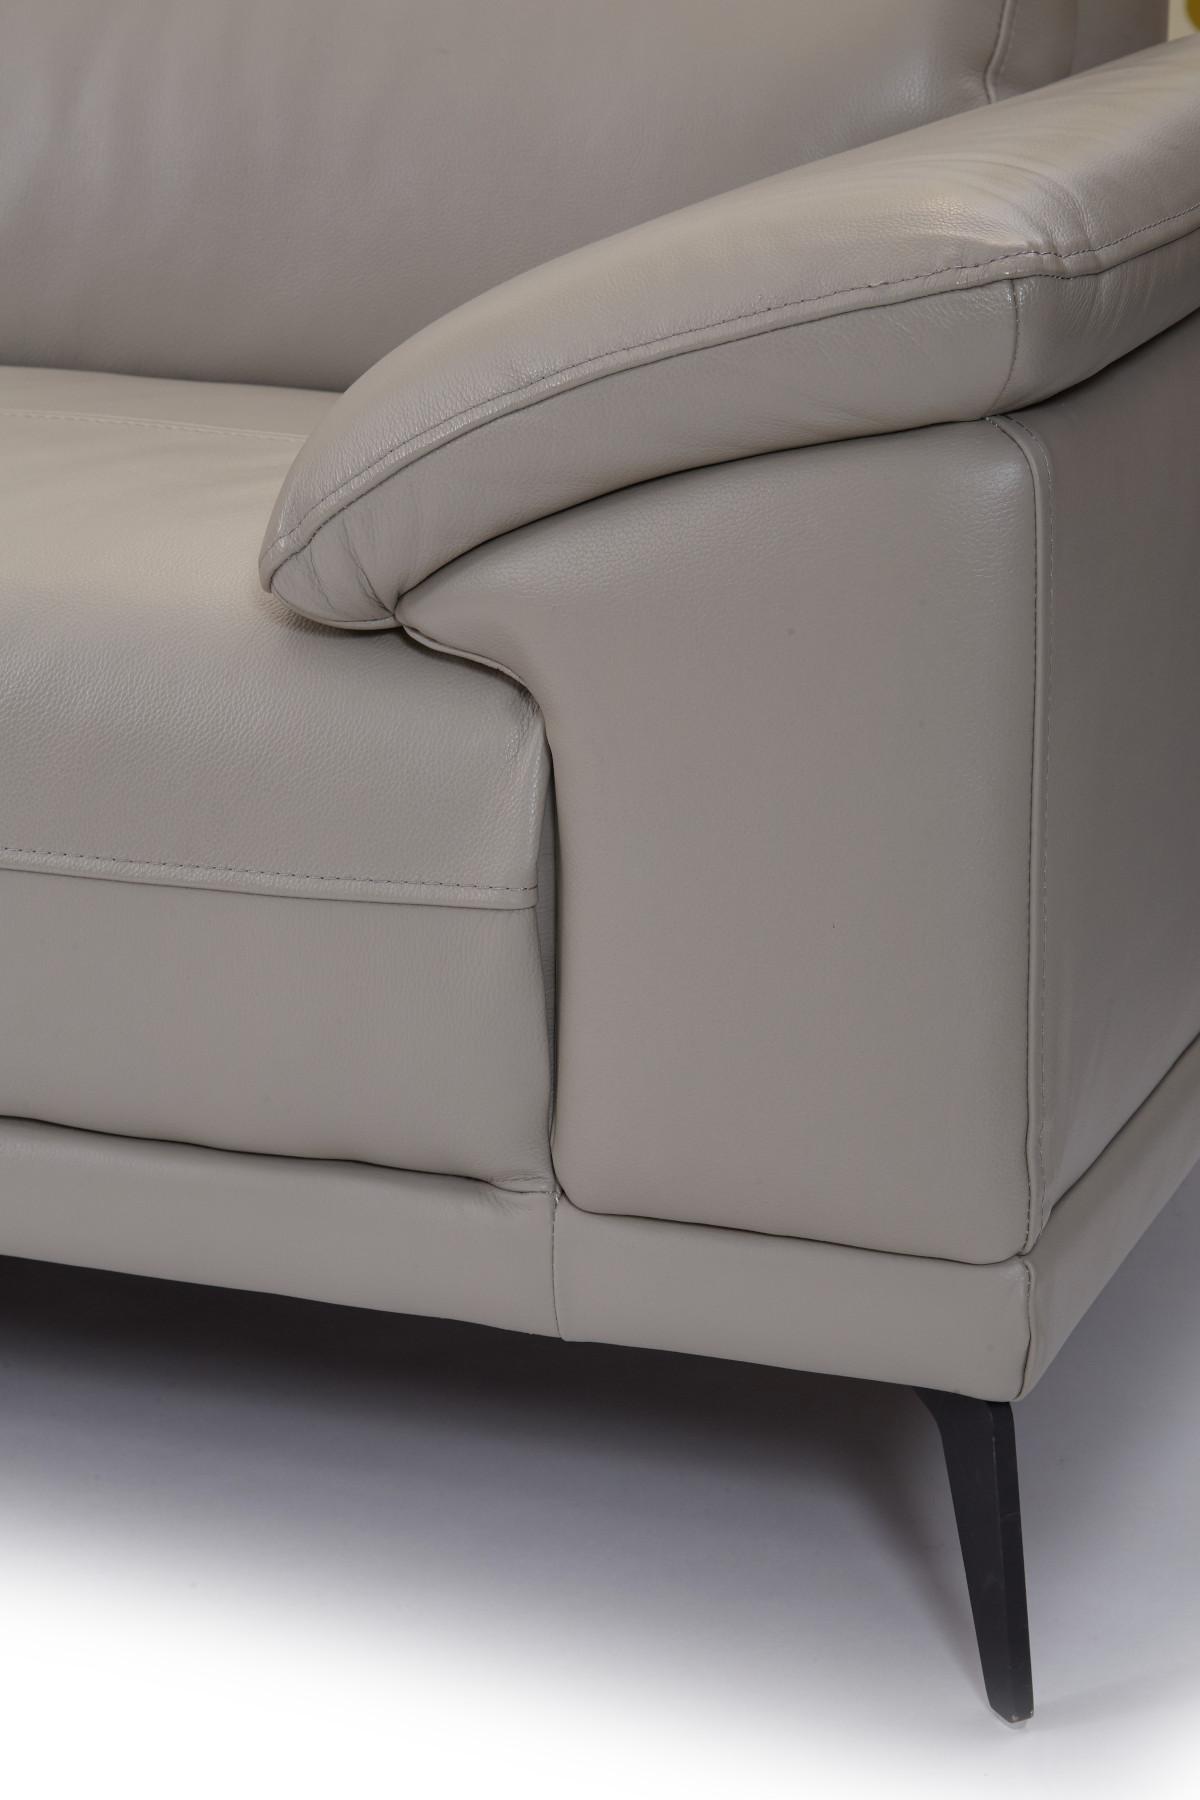 Montero LHF Corner Sofa